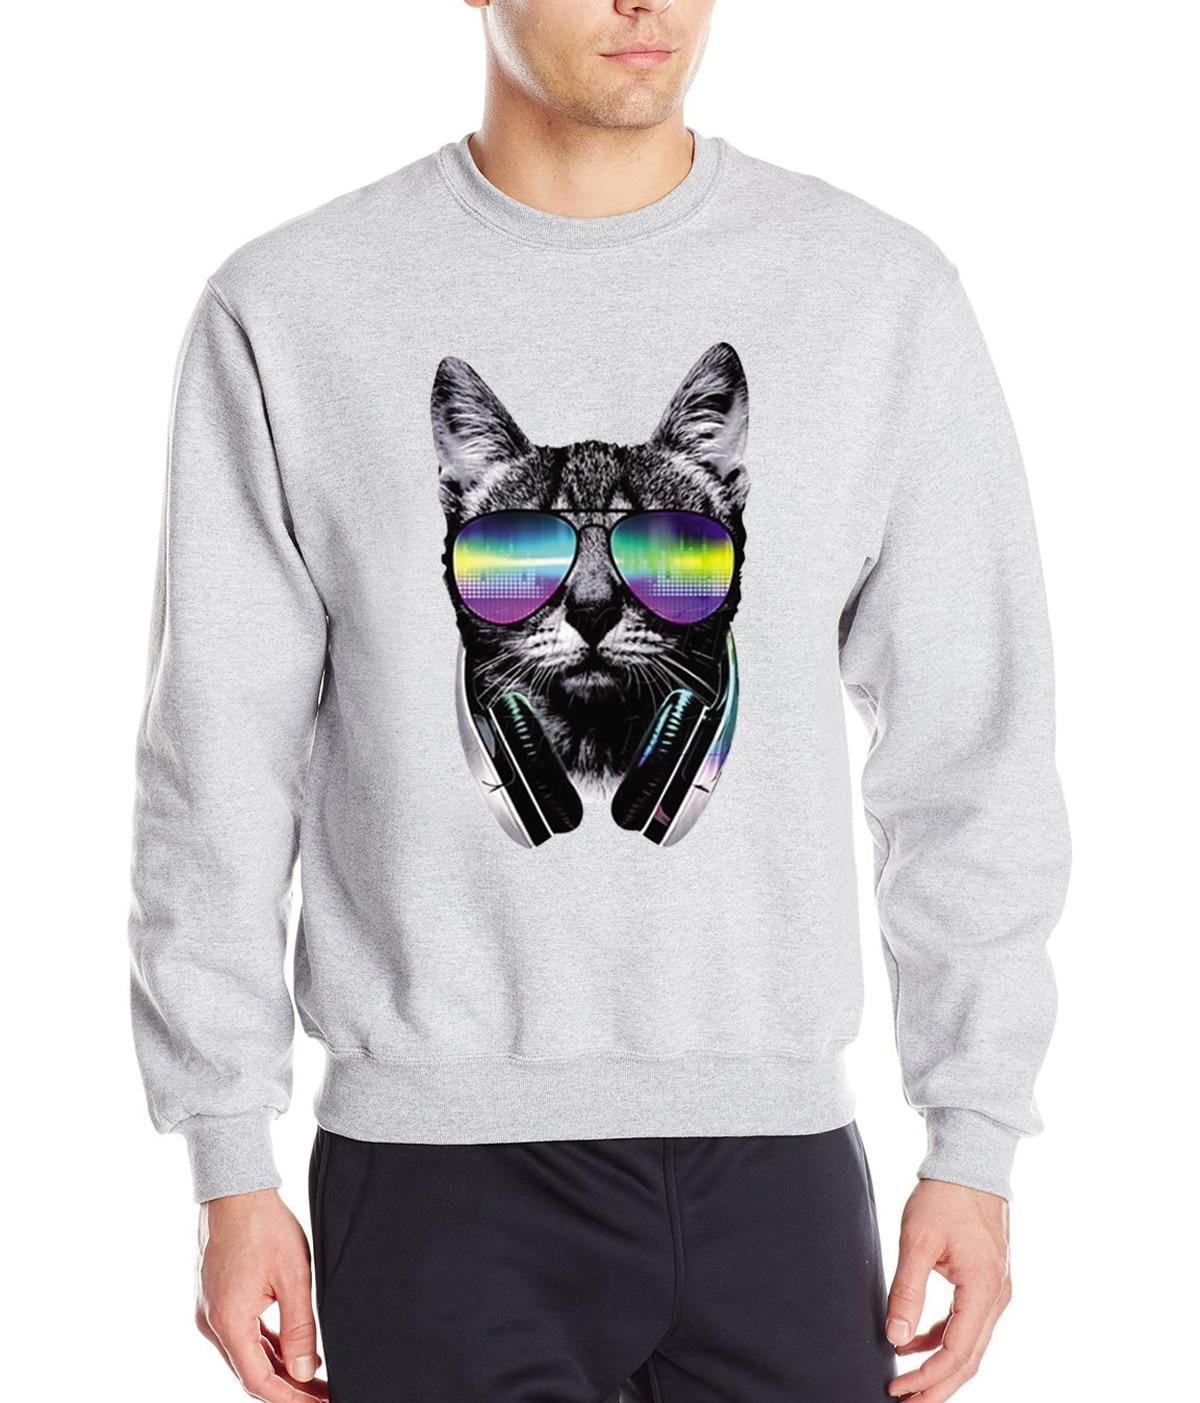 Animal Music DJ Cat Men Hoodies 2017 Spring Winter Fleece 3D Printed Anime Sweatshirt Funny Creative Hoodie Casual Tracksuit Men